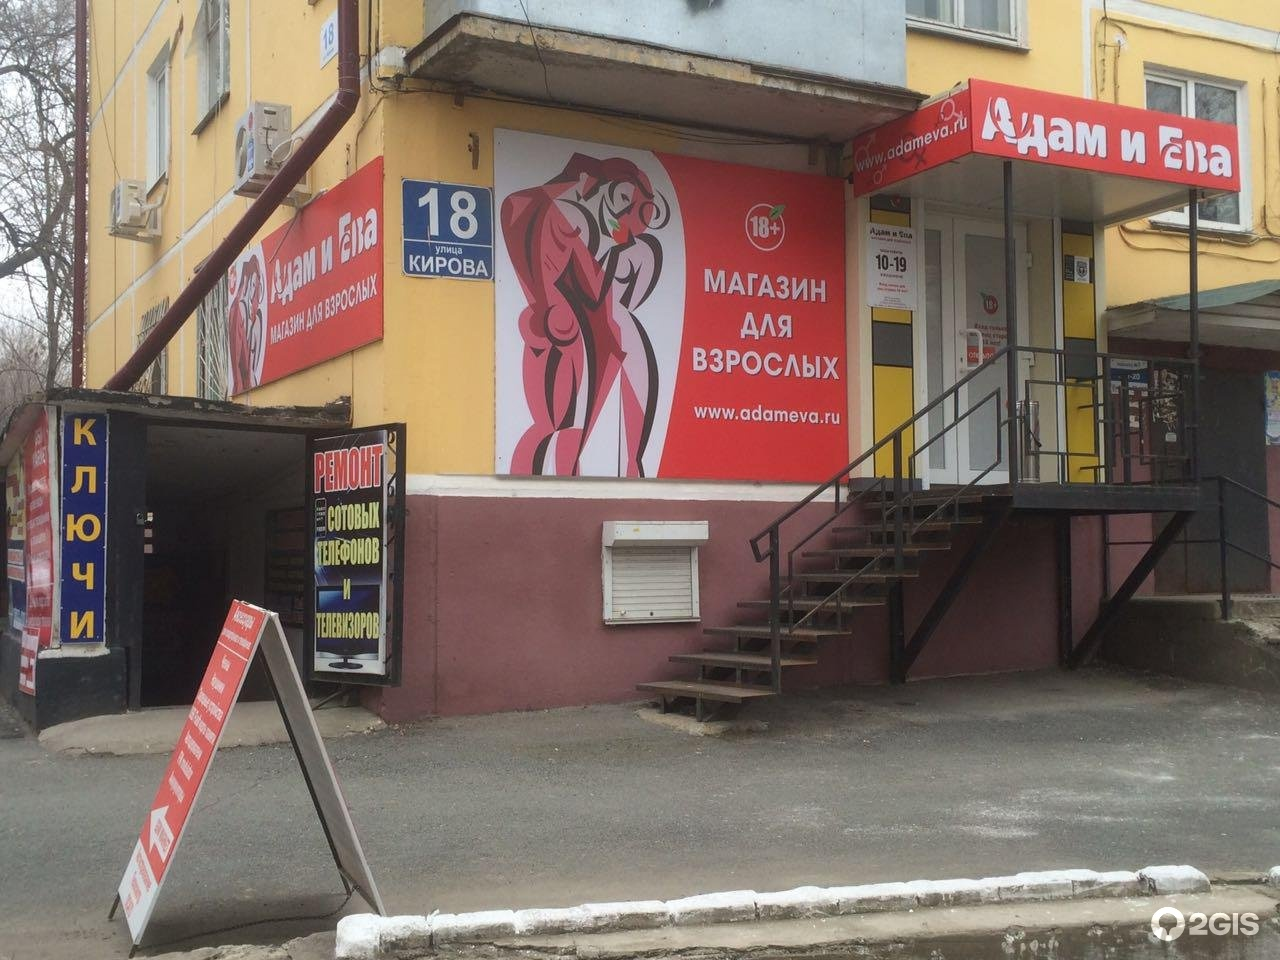 Интим магазин адам и ева